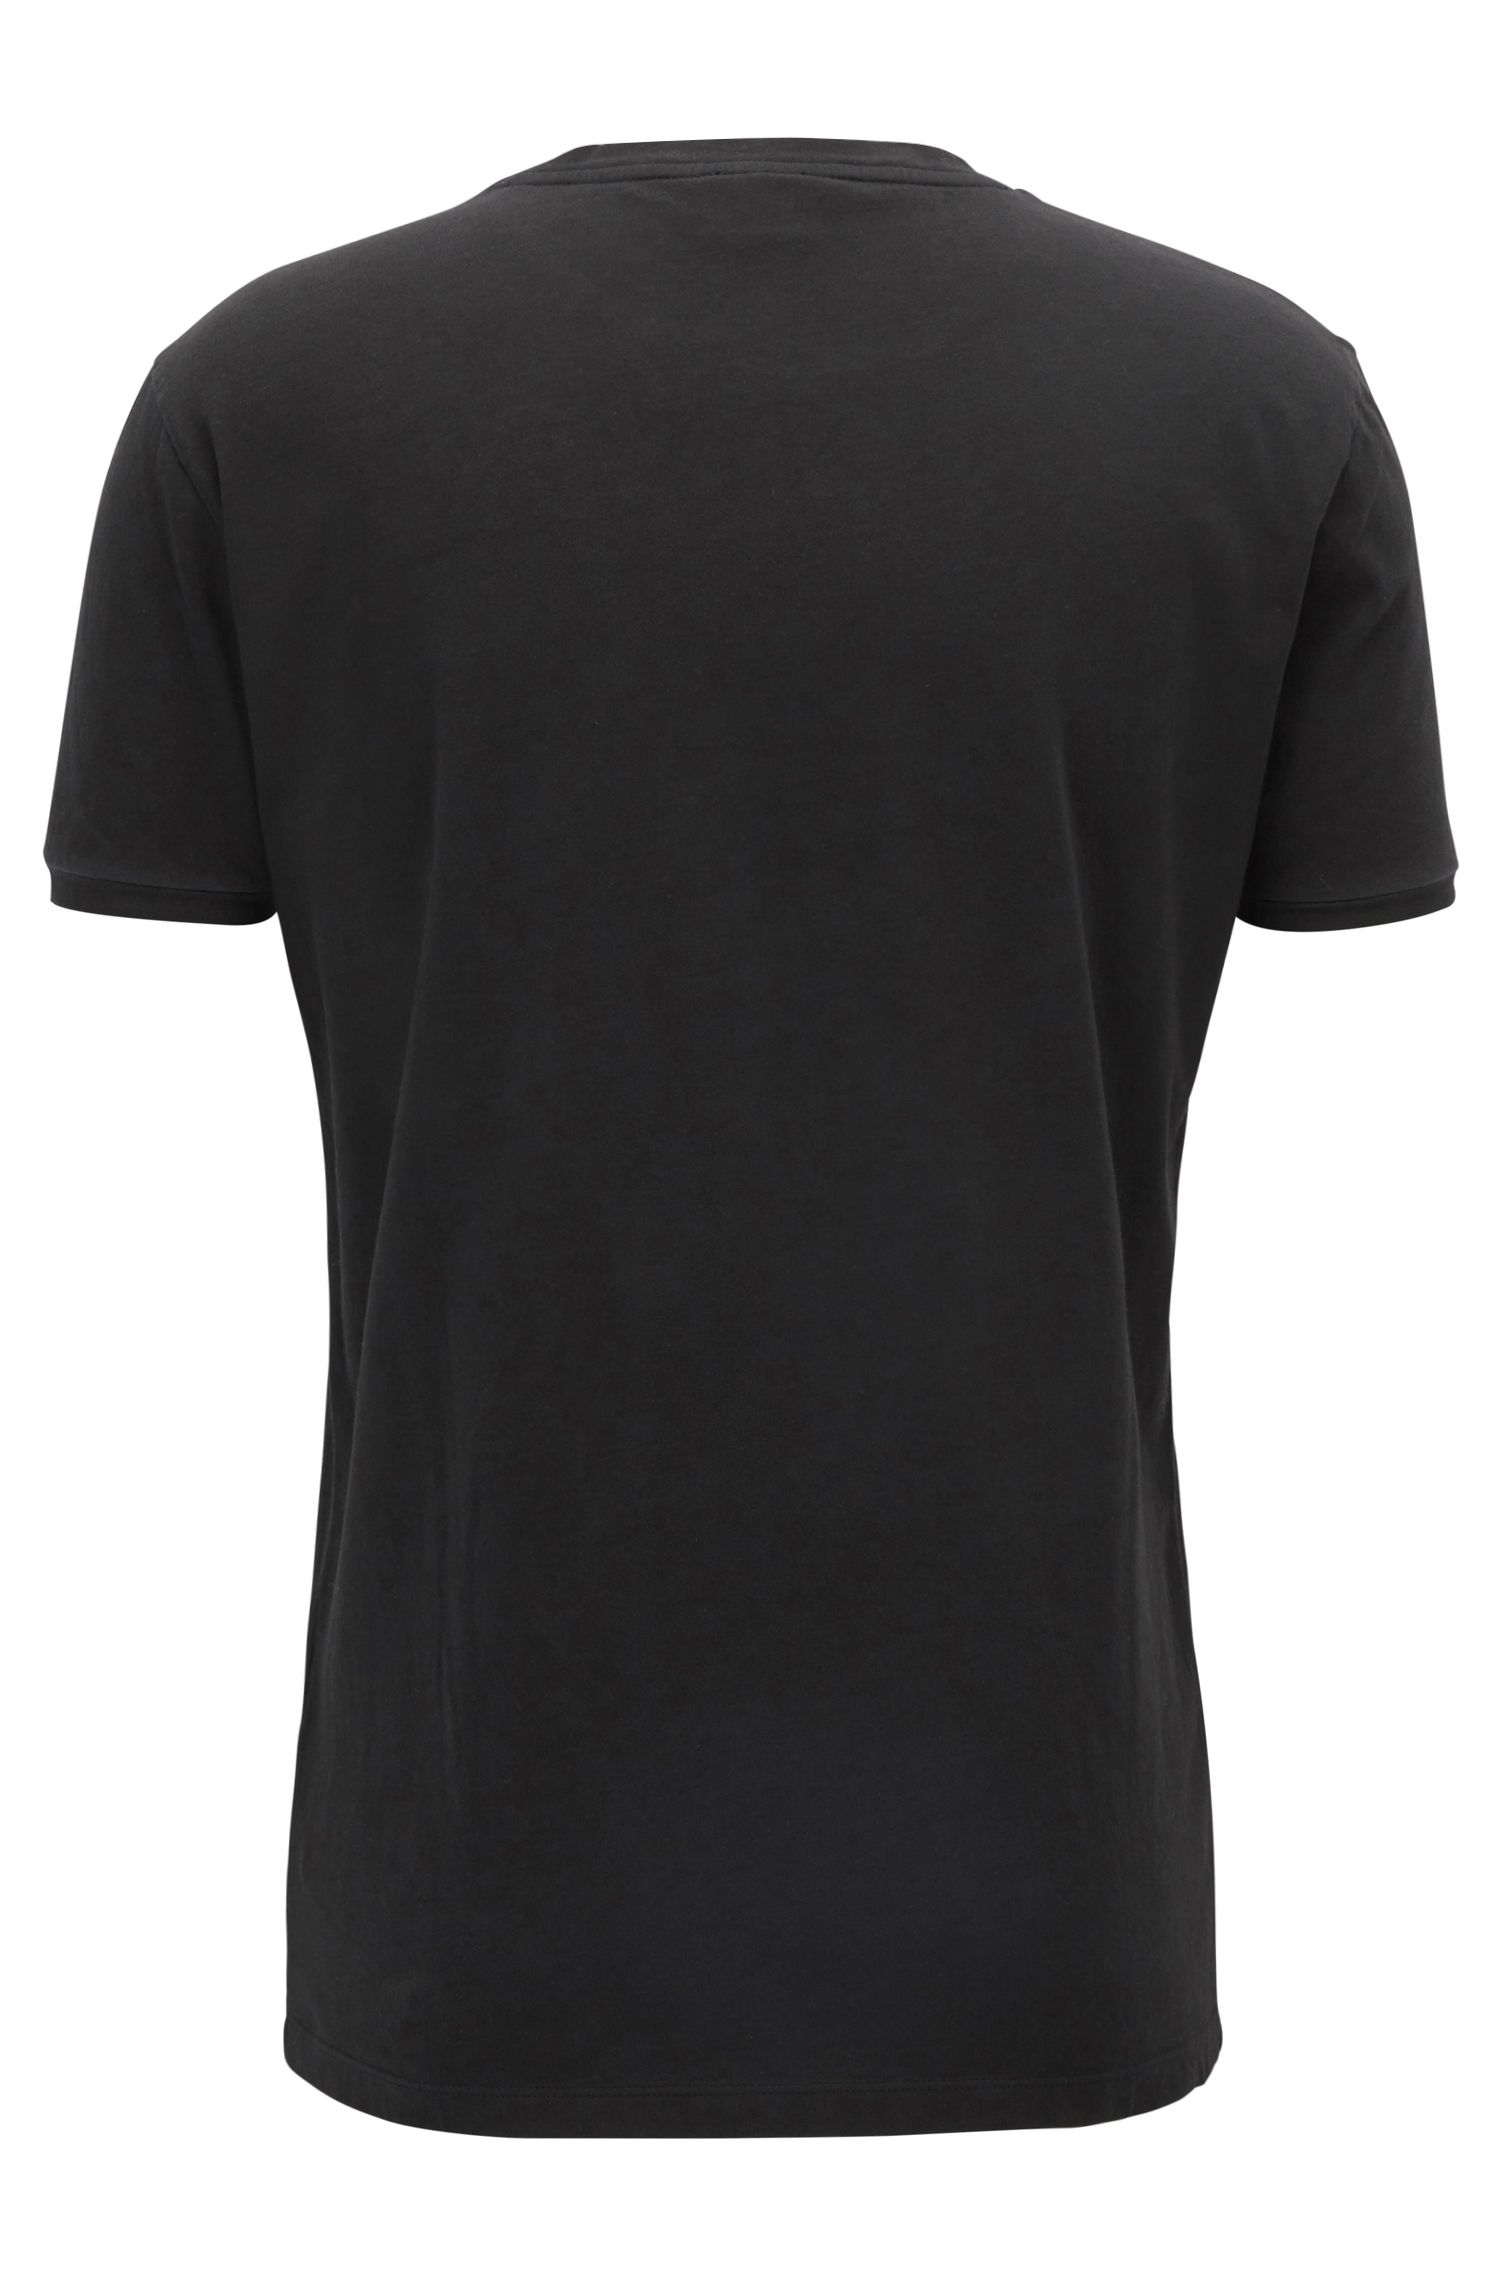 Camiseta de algodón con logo flocado